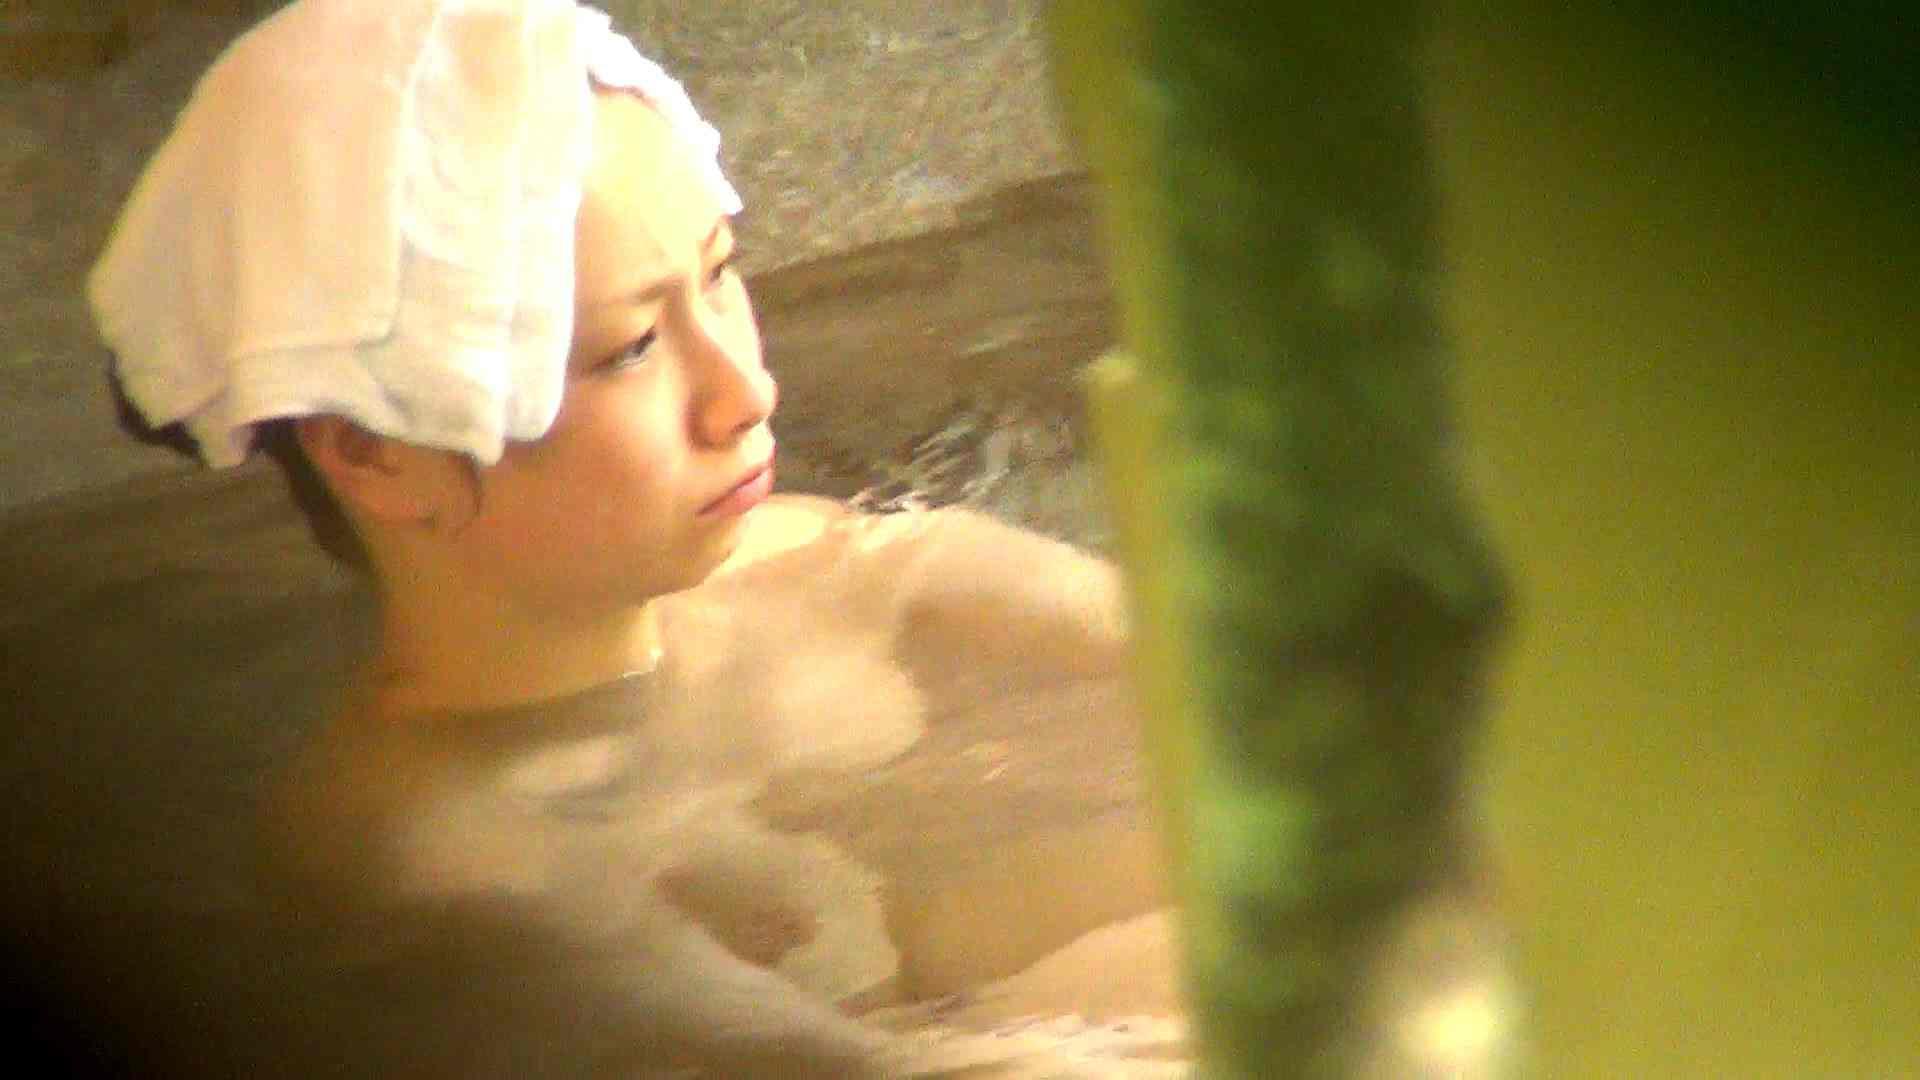 Aquaな露天風呂Vol.266 盗撮映像  83Pix 64